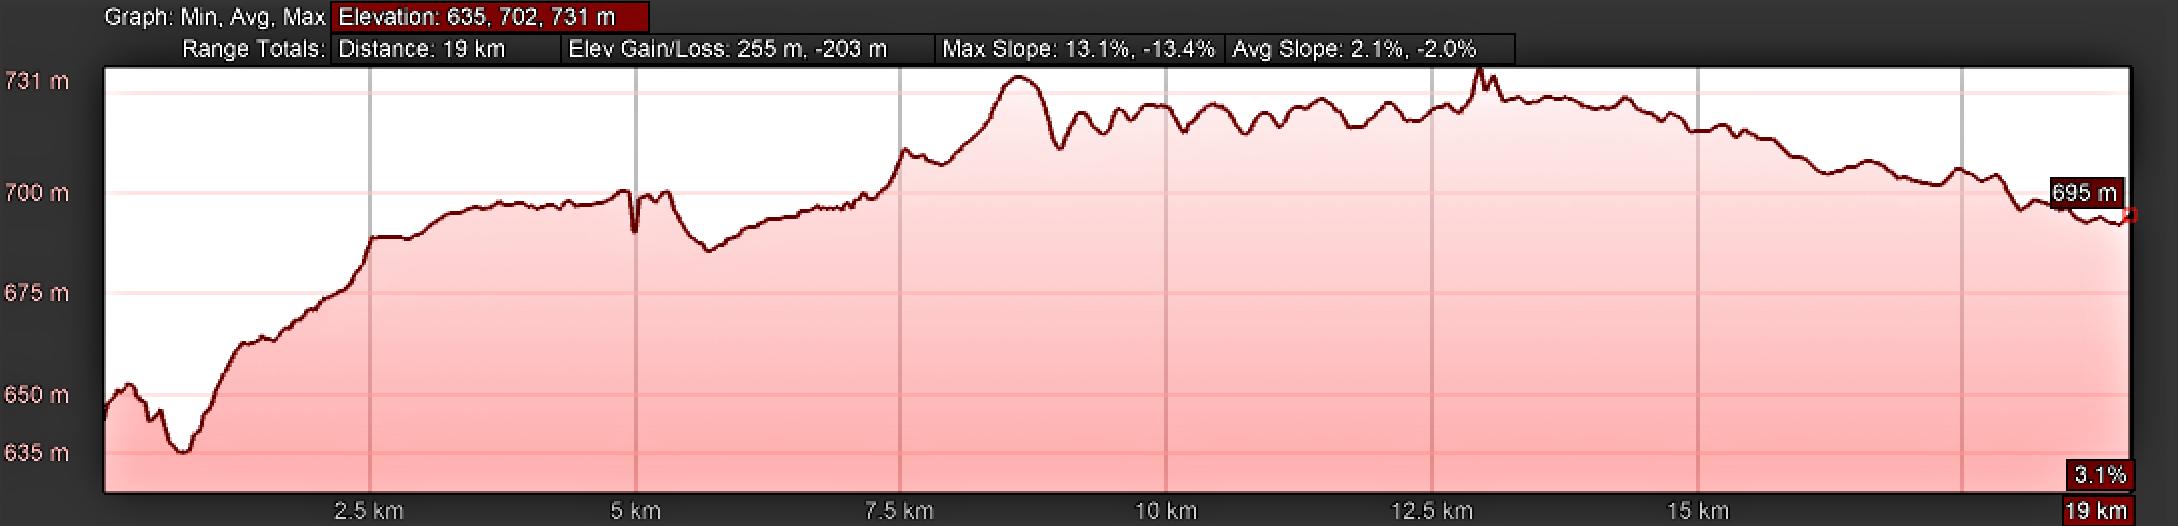 Elevation Profile, Vía de la Plata, Zamora to Montamarta